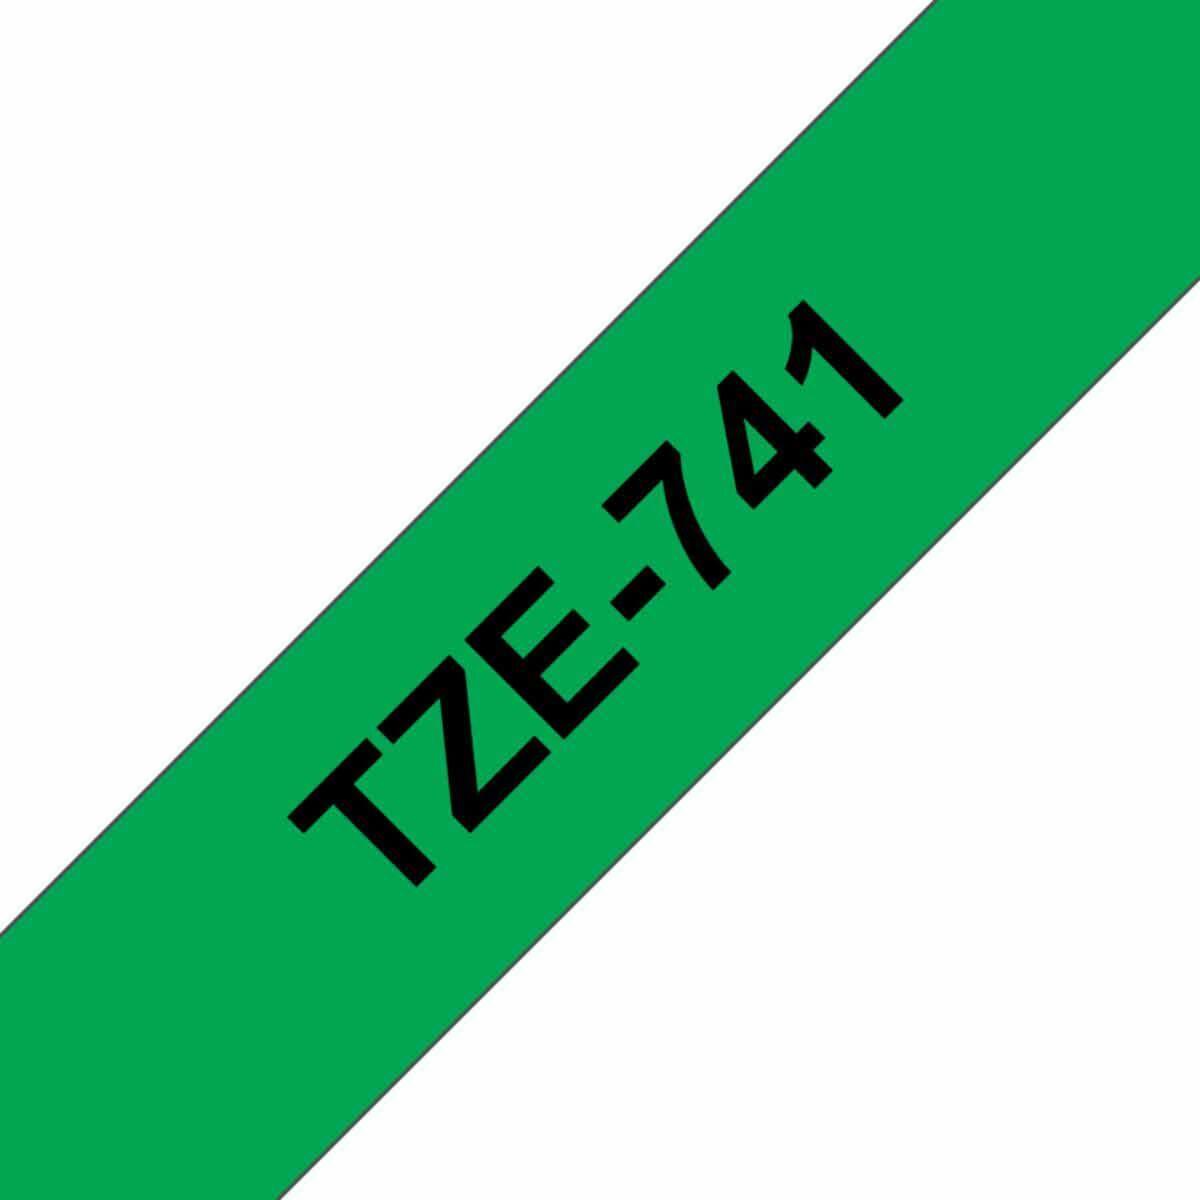 Brother TZE741 Tape Black/Green